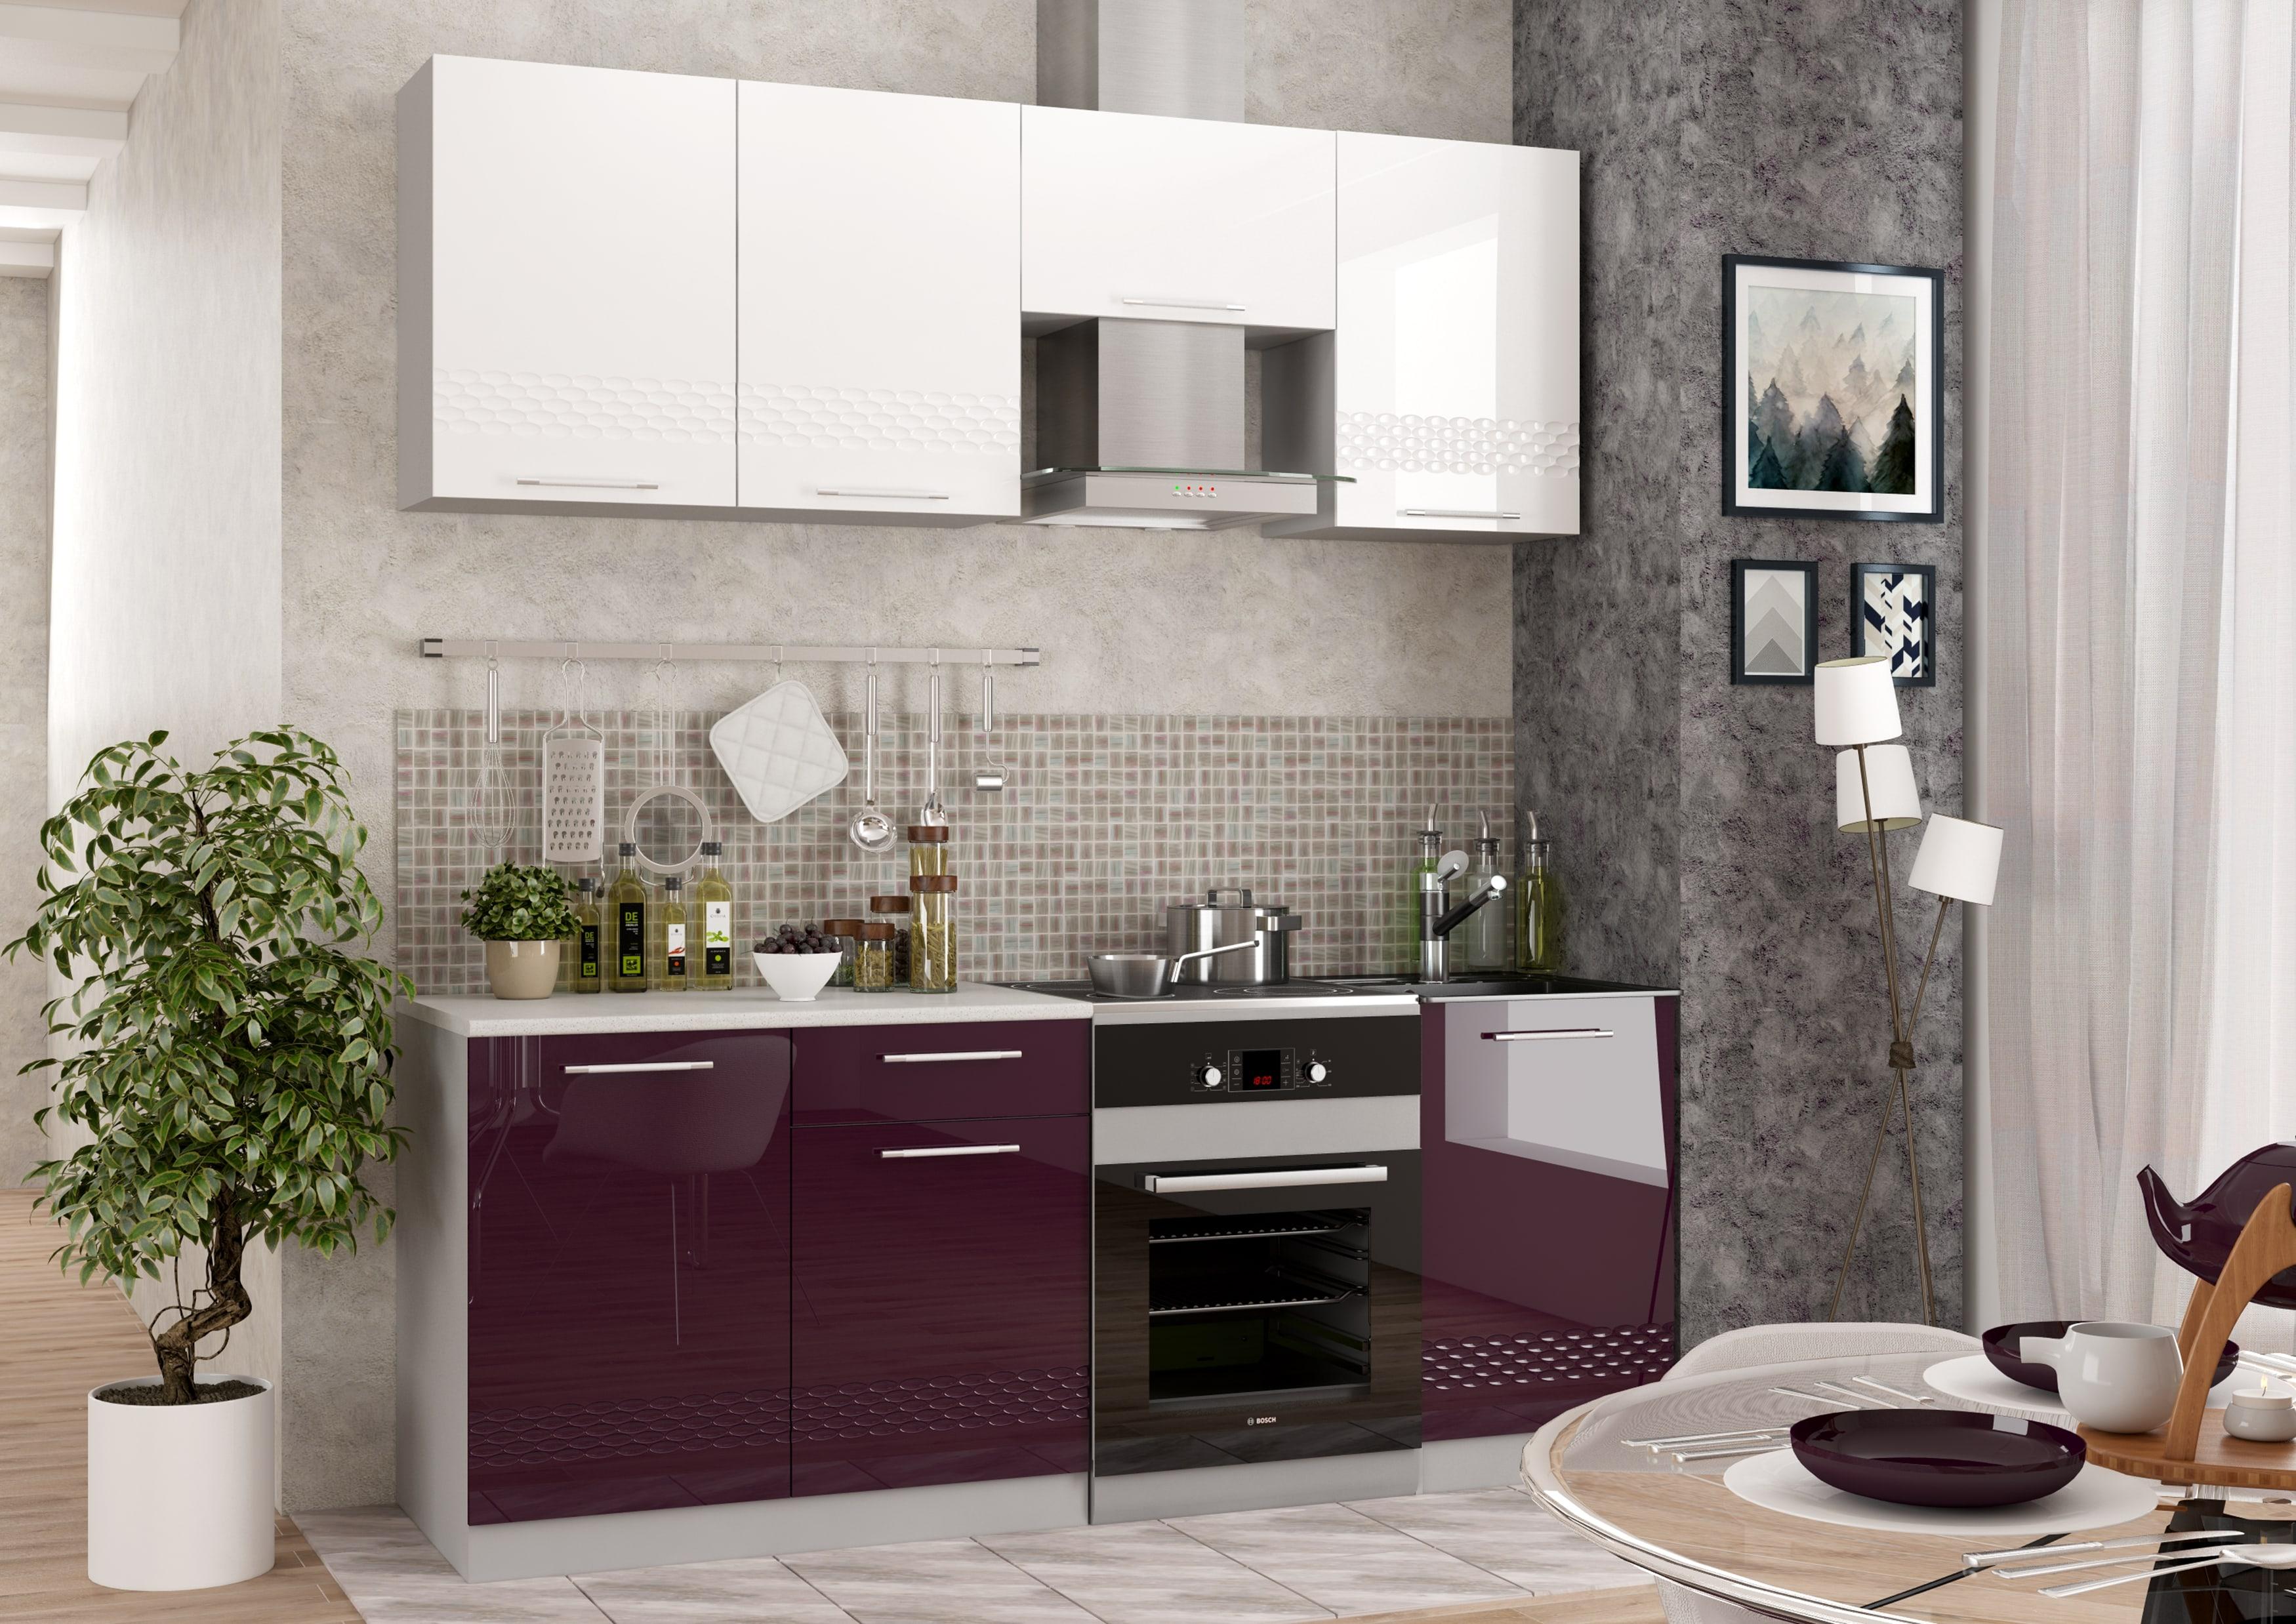 Кухня Капля 3D МСЯ 400 Шкаф нижний глубина 330